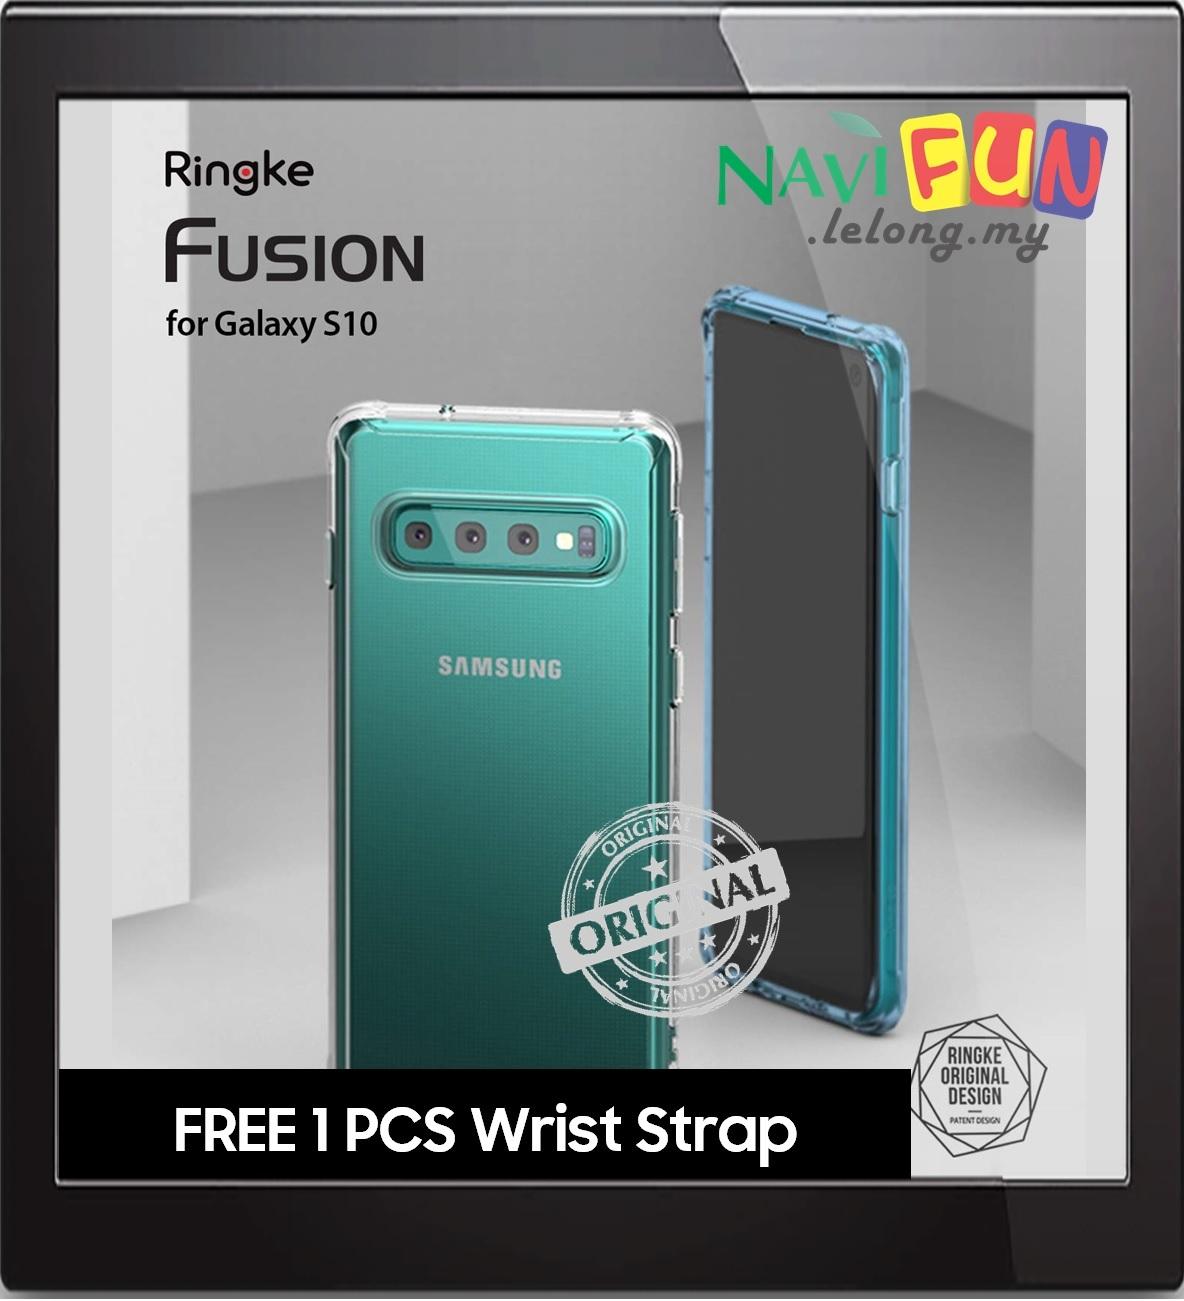 FusionS10.jpg